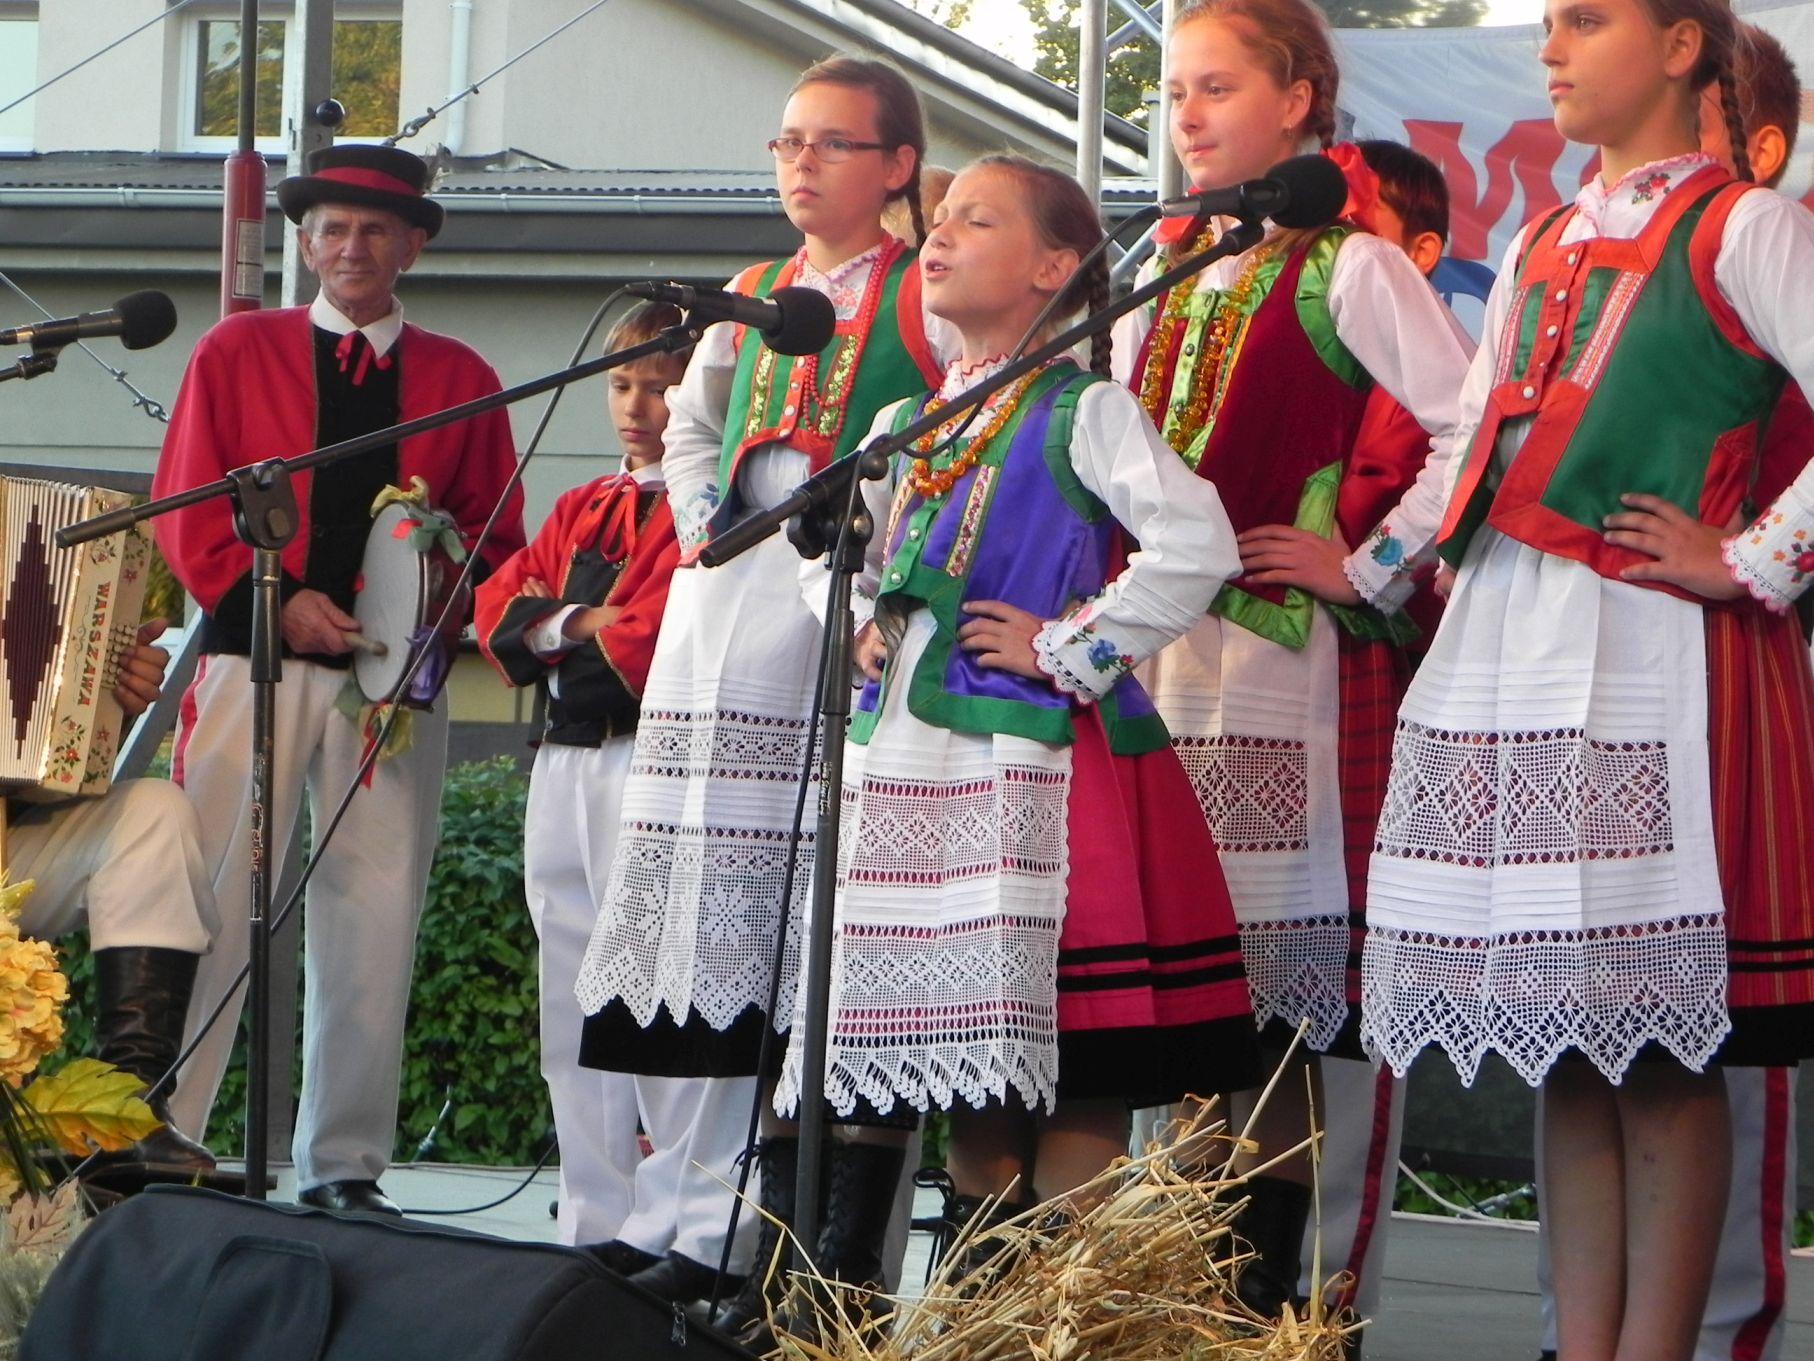 2013-09-10 Festyn - Mińsk Maz (161)